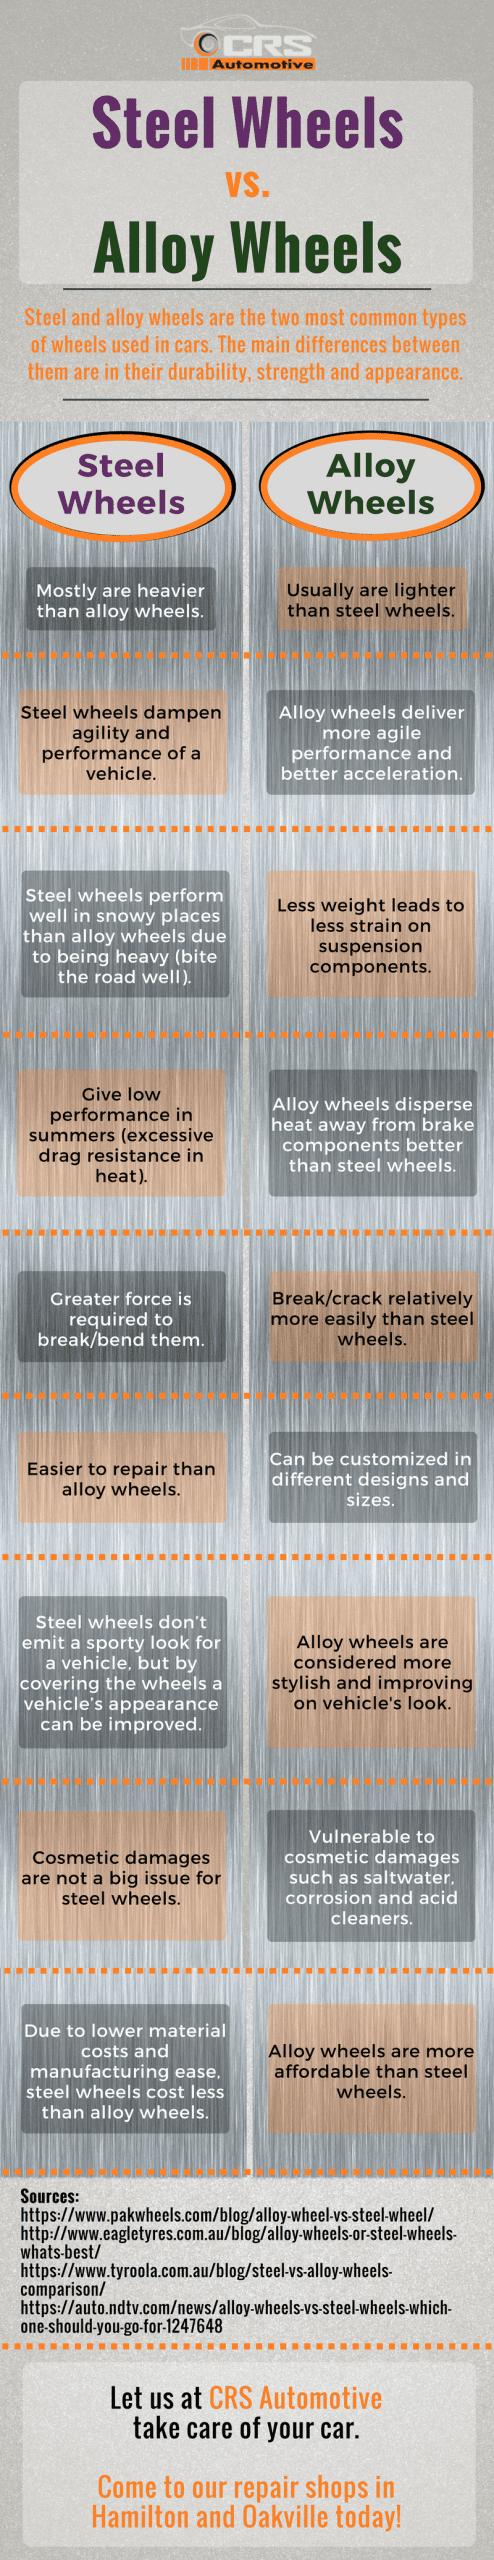 Steel Wheels vs. Alloy Wheels INFOGRAPHIC